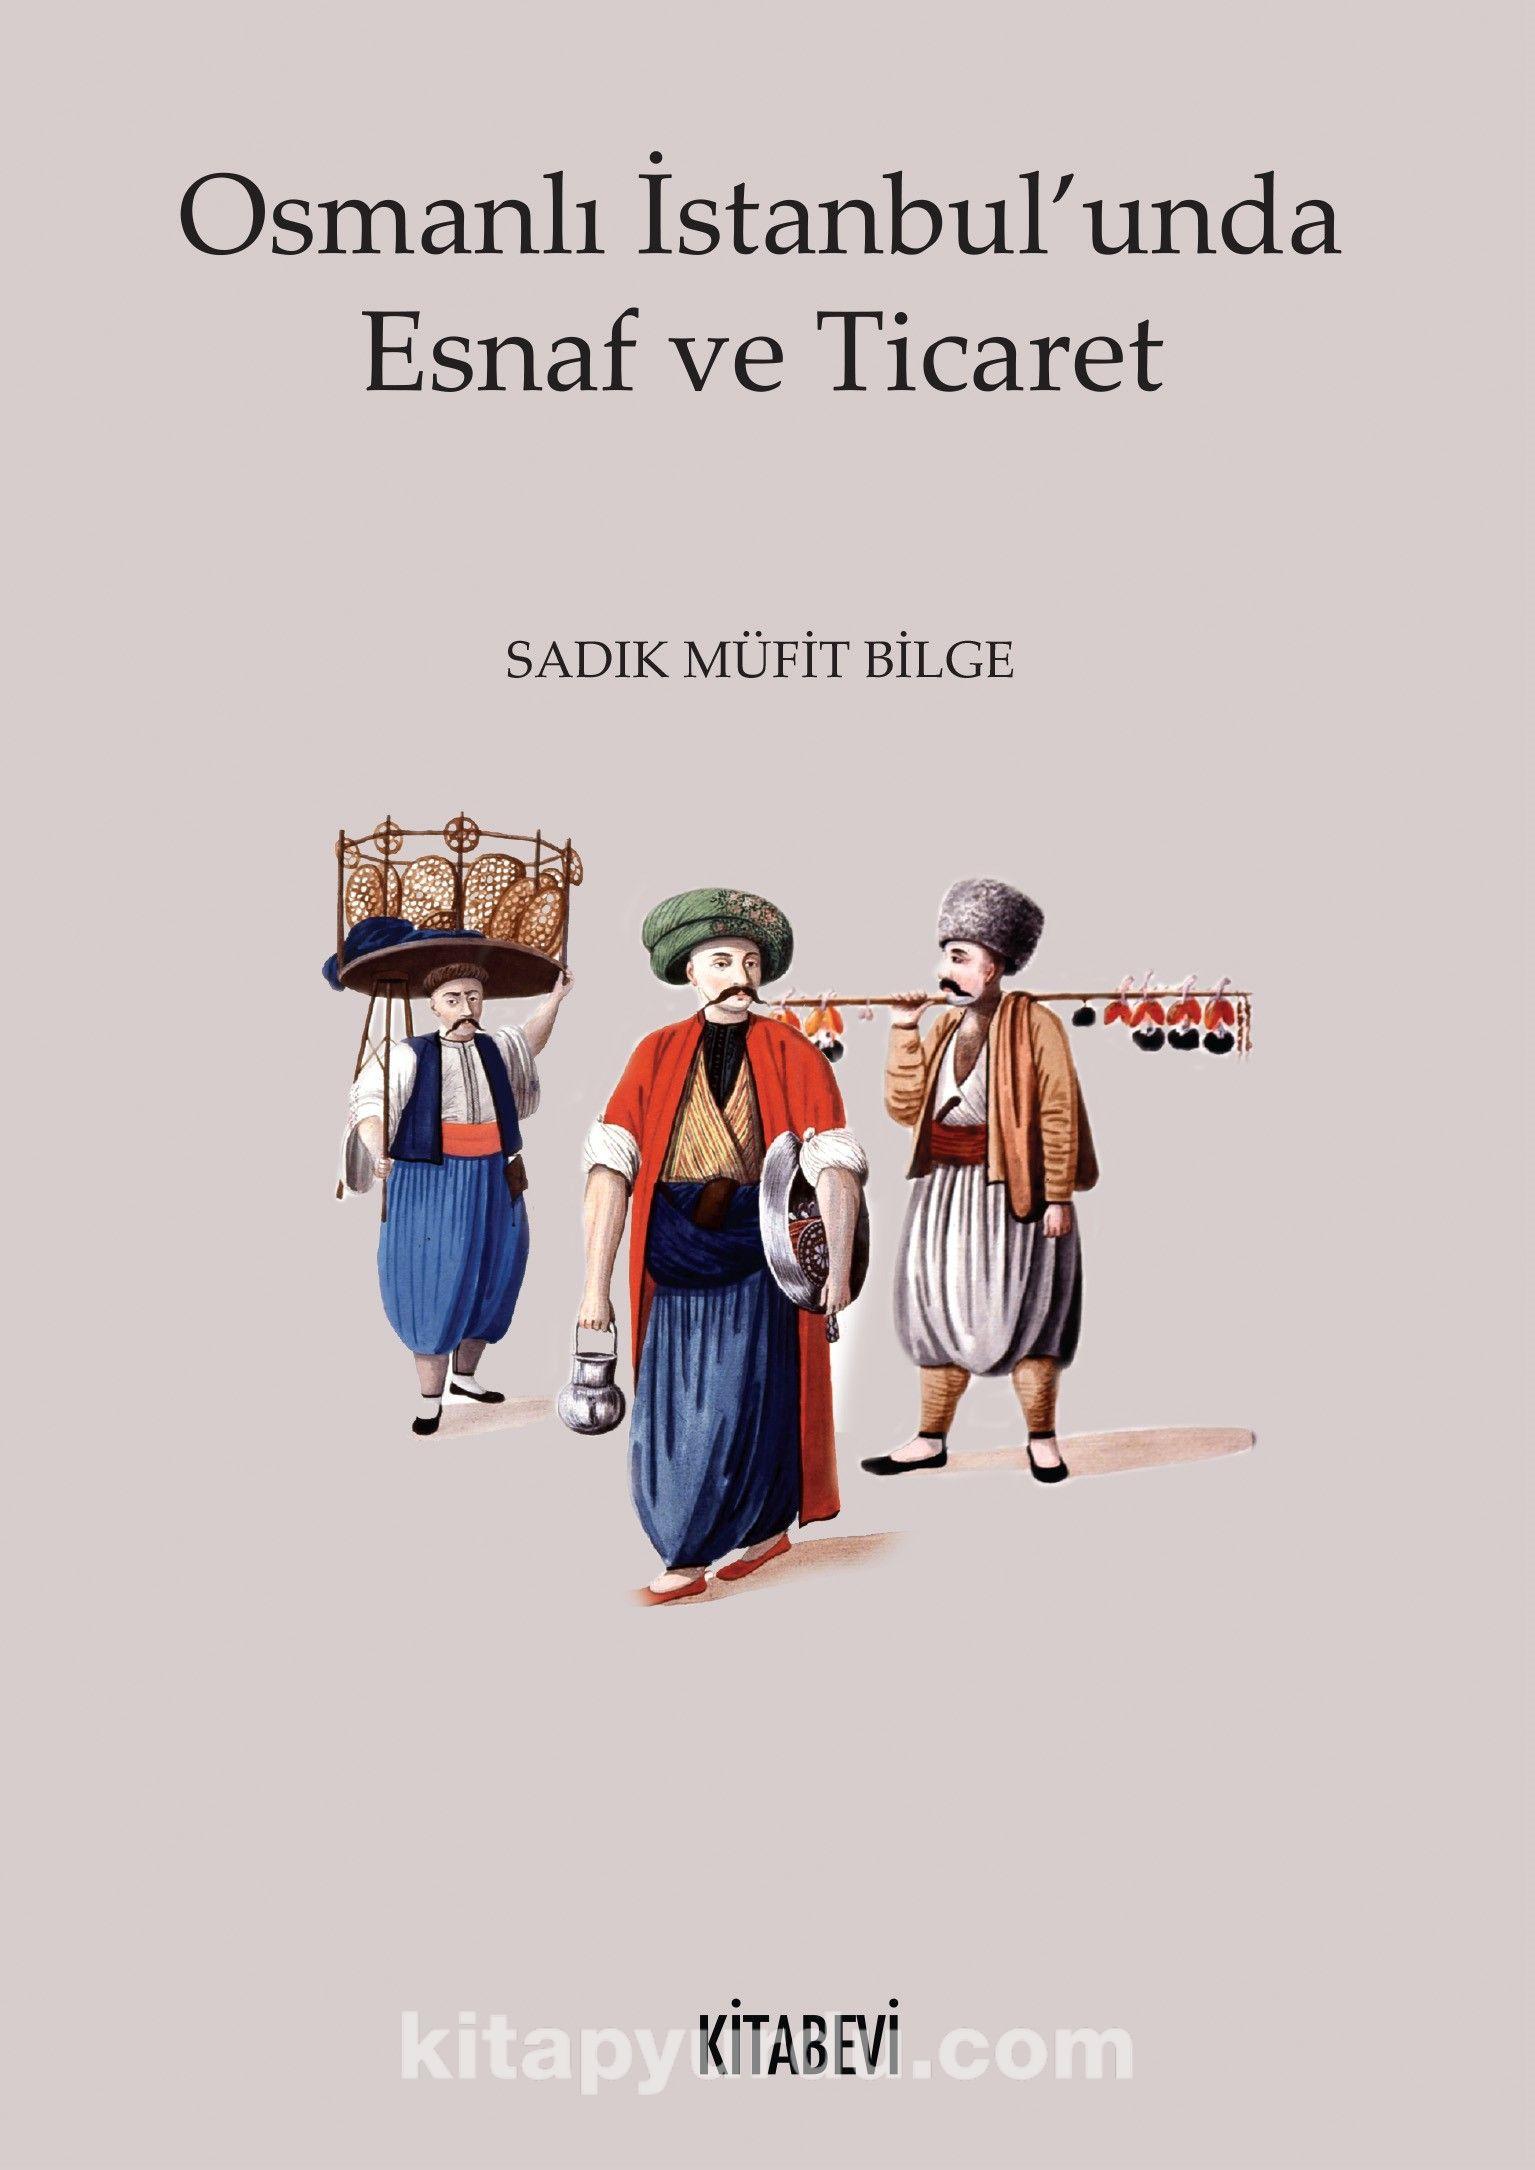 Osmanlı İstanbul'unda Esnaf ve Ticaret - Sadık Müfit Bilge pdf epub